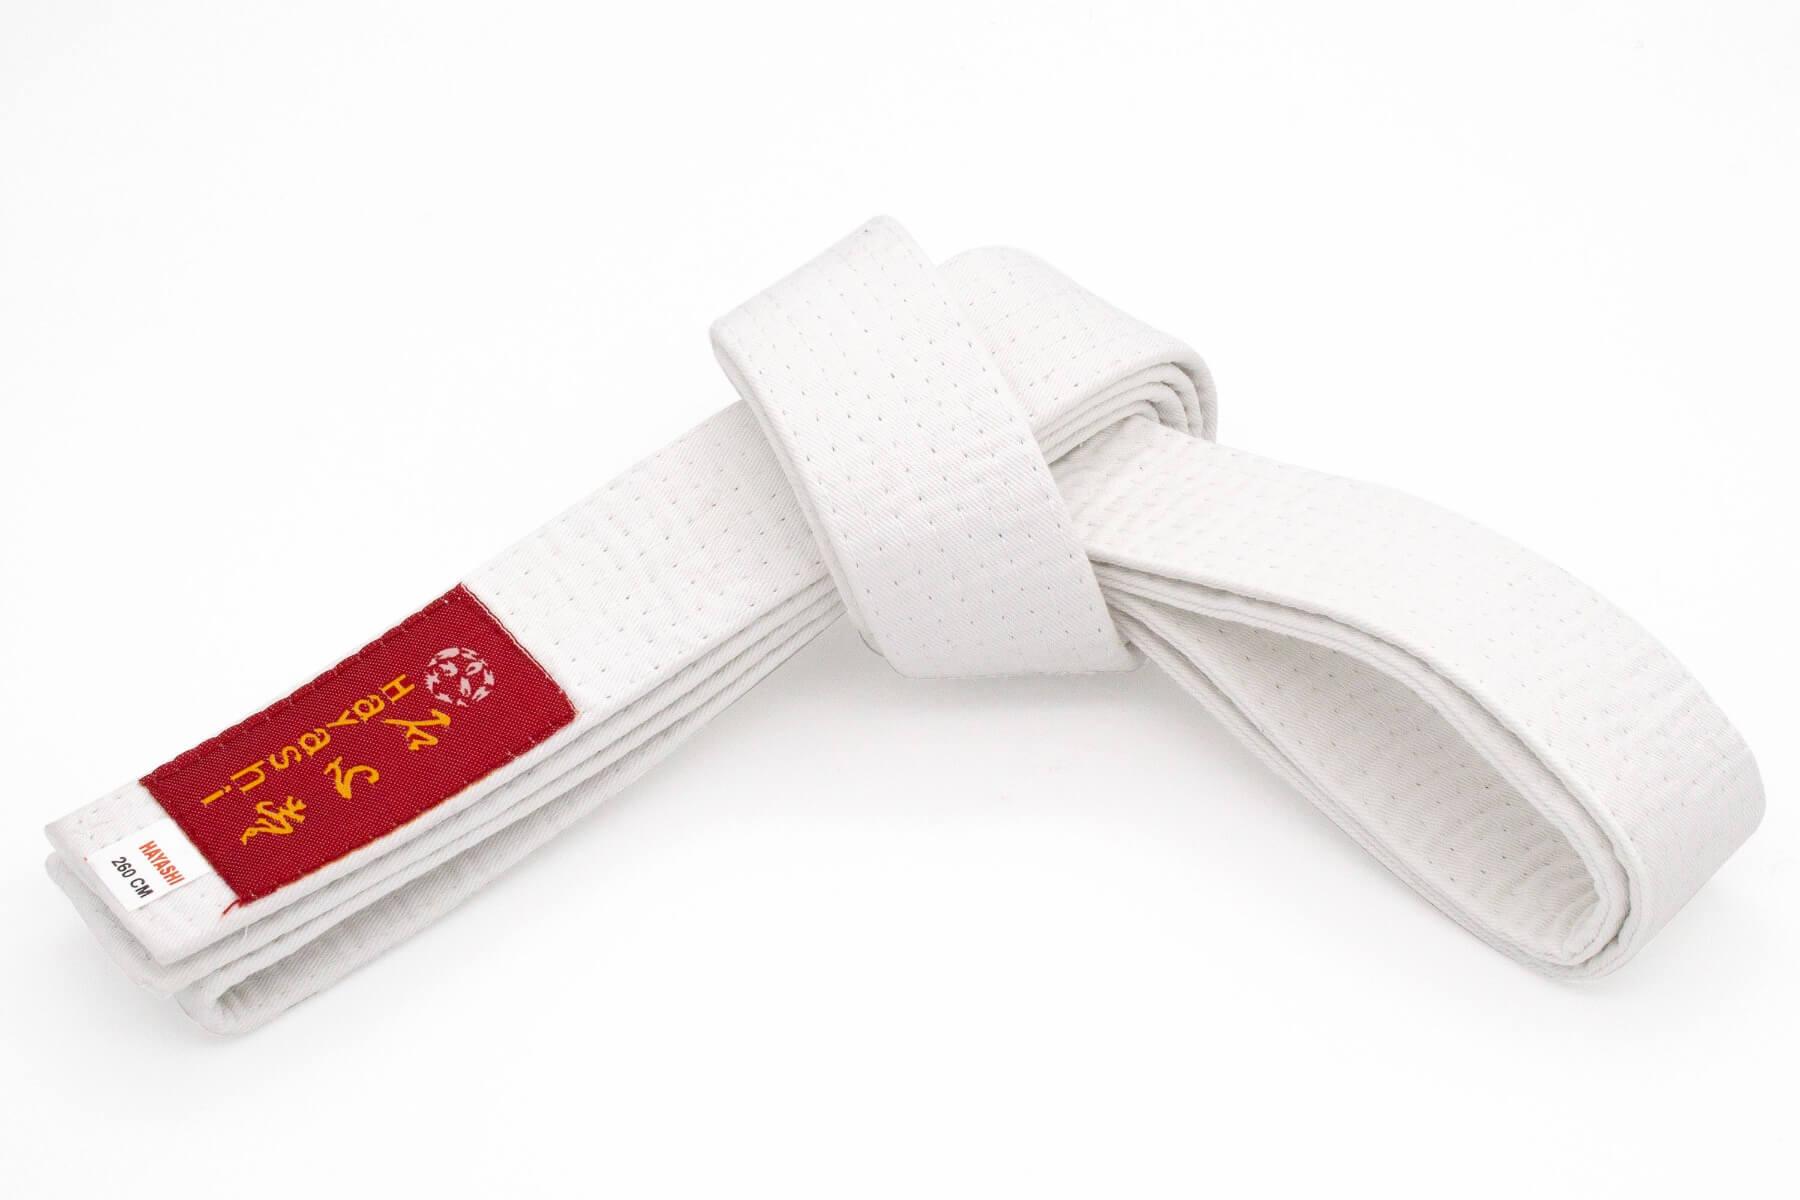 Budogürtel Hayashi 40mm Weiss